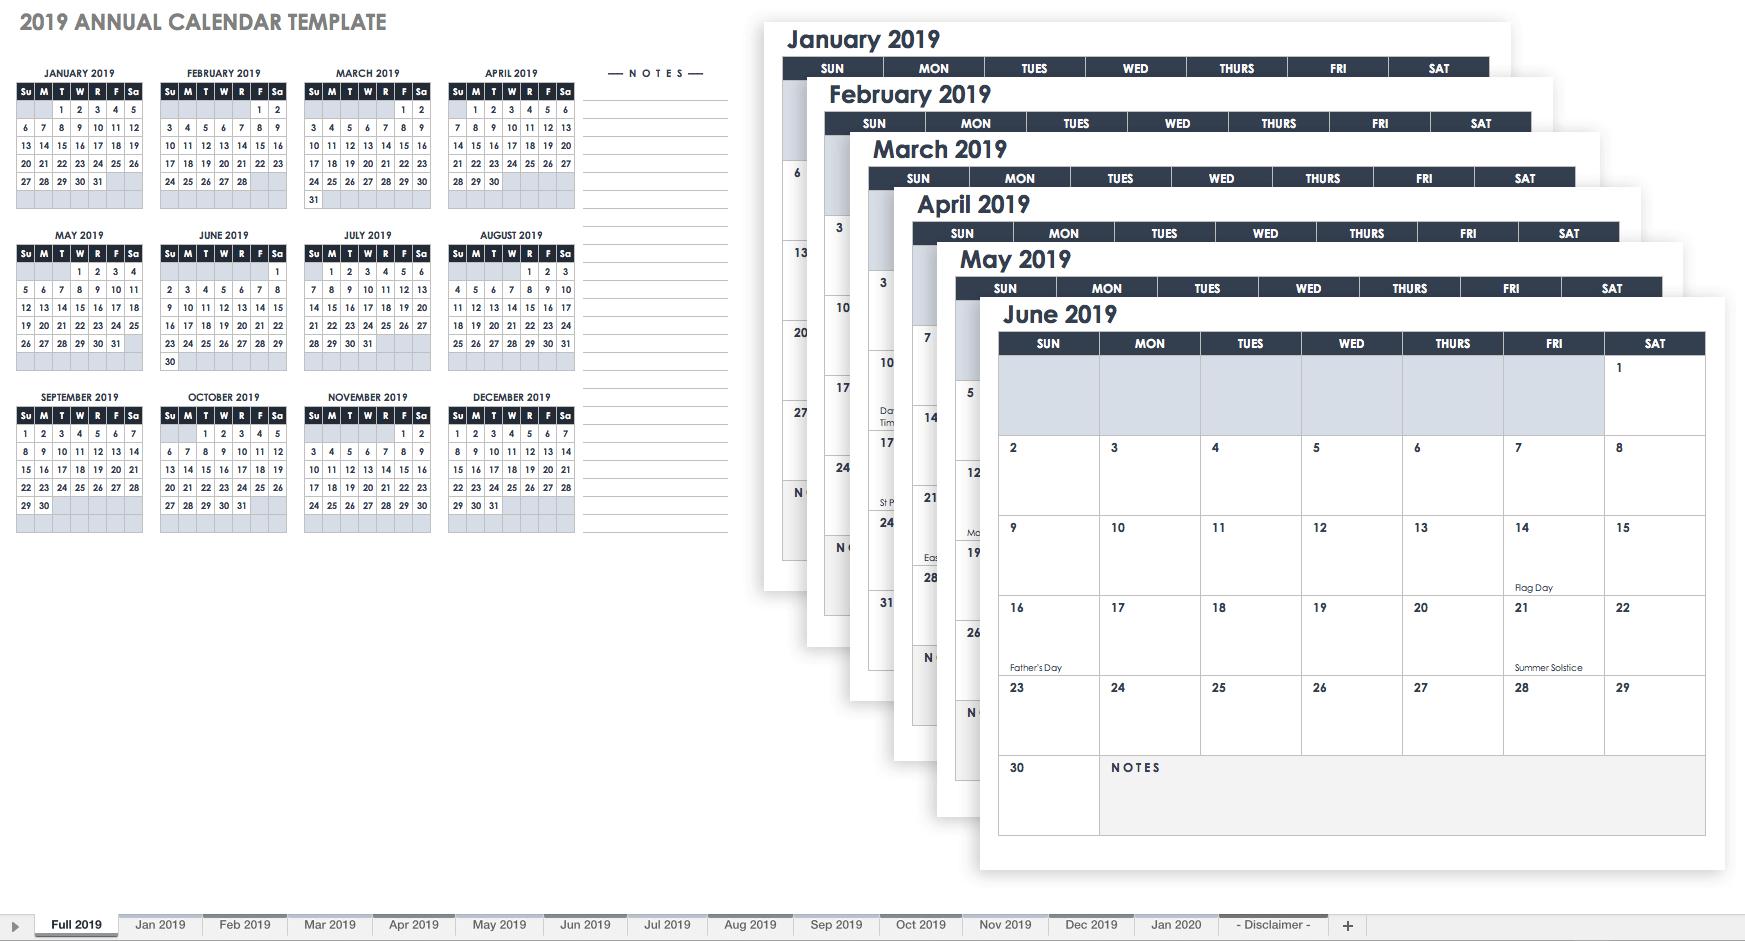 15 Free Monthly Calendar Templates | Smartsheet with regard to 2020 Free Printable Emploee Calendars